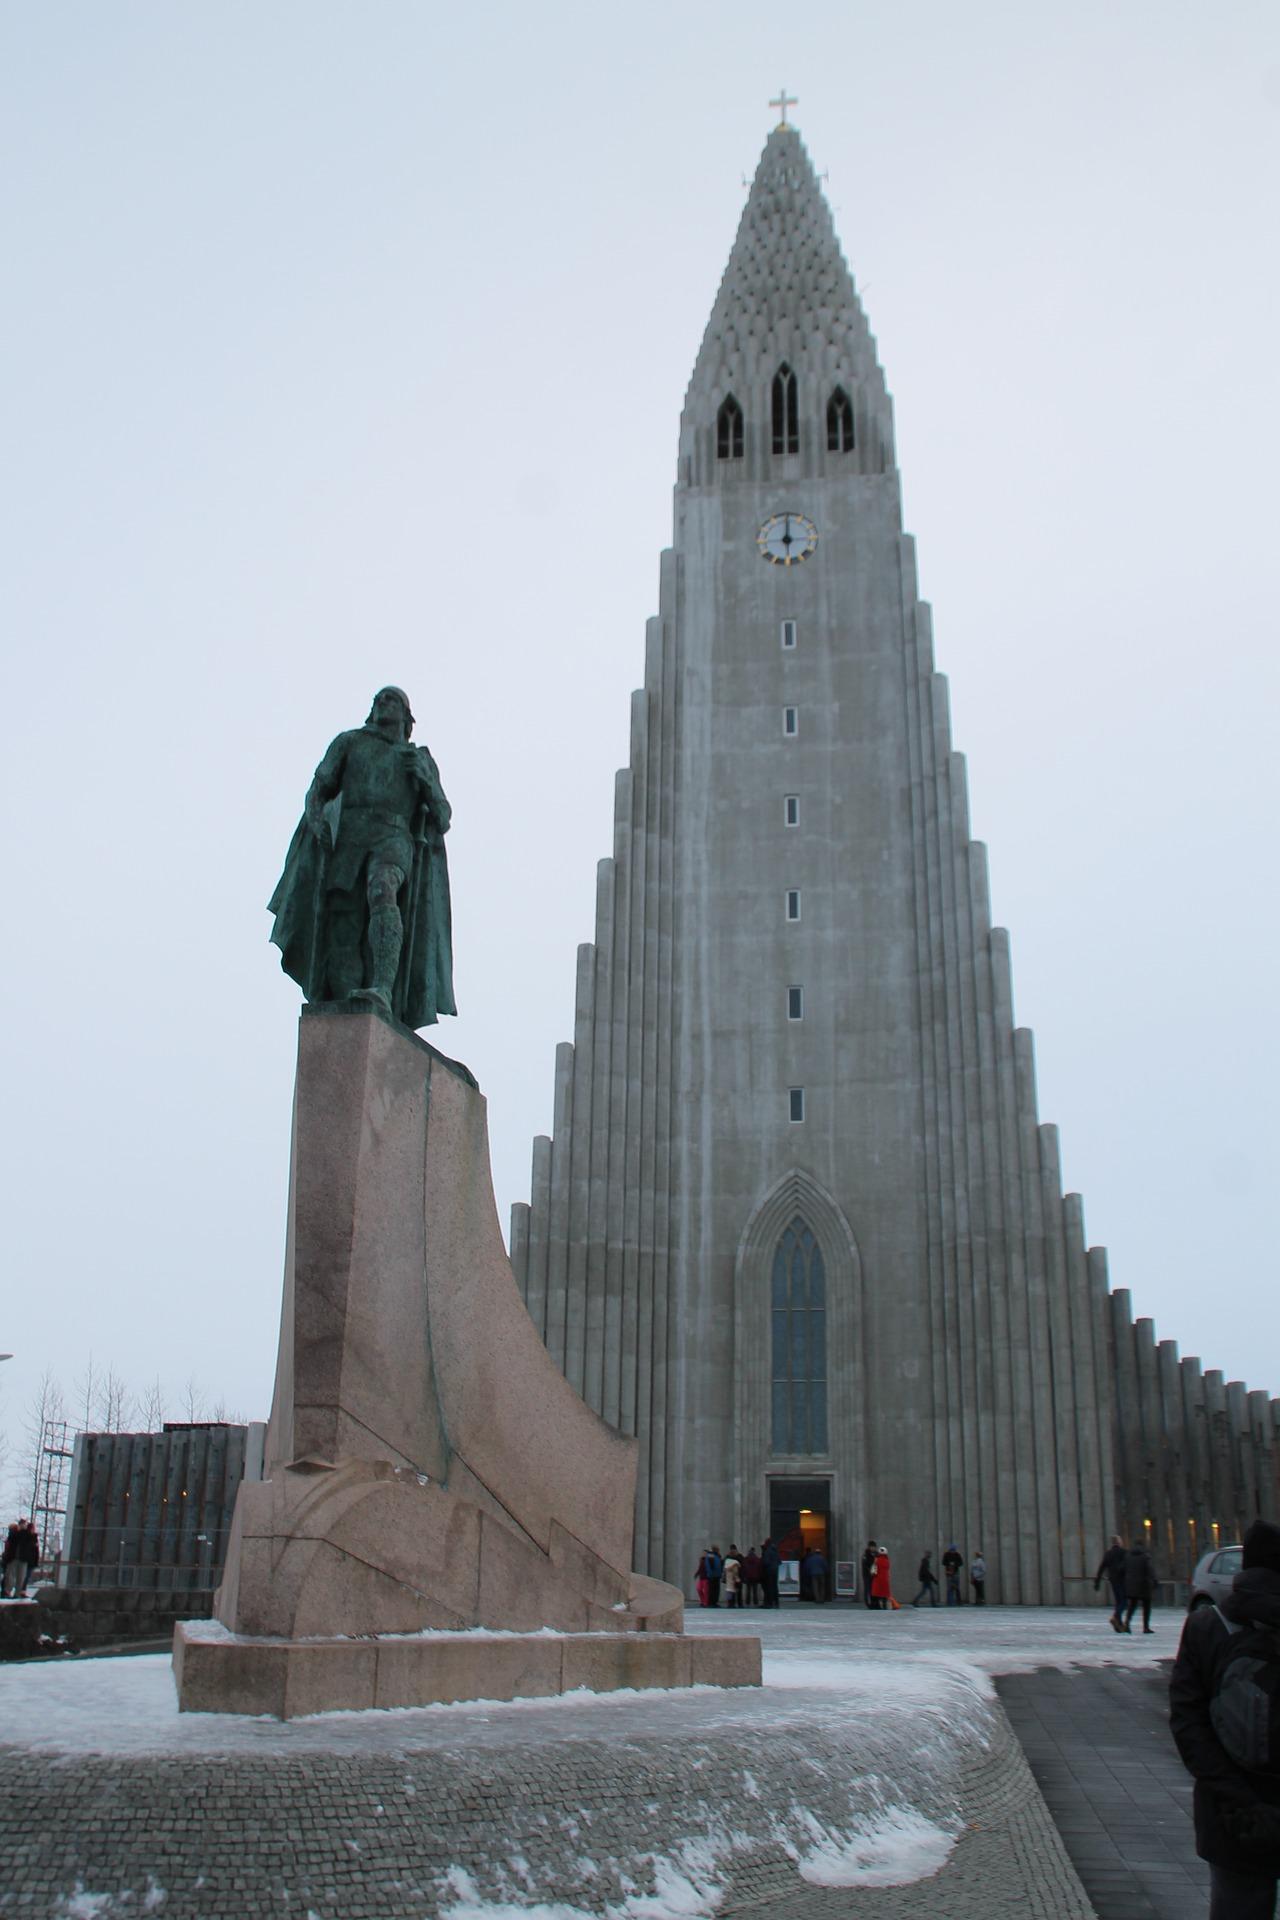 Hallgrímskirkja church in Reykjavik, Iceland